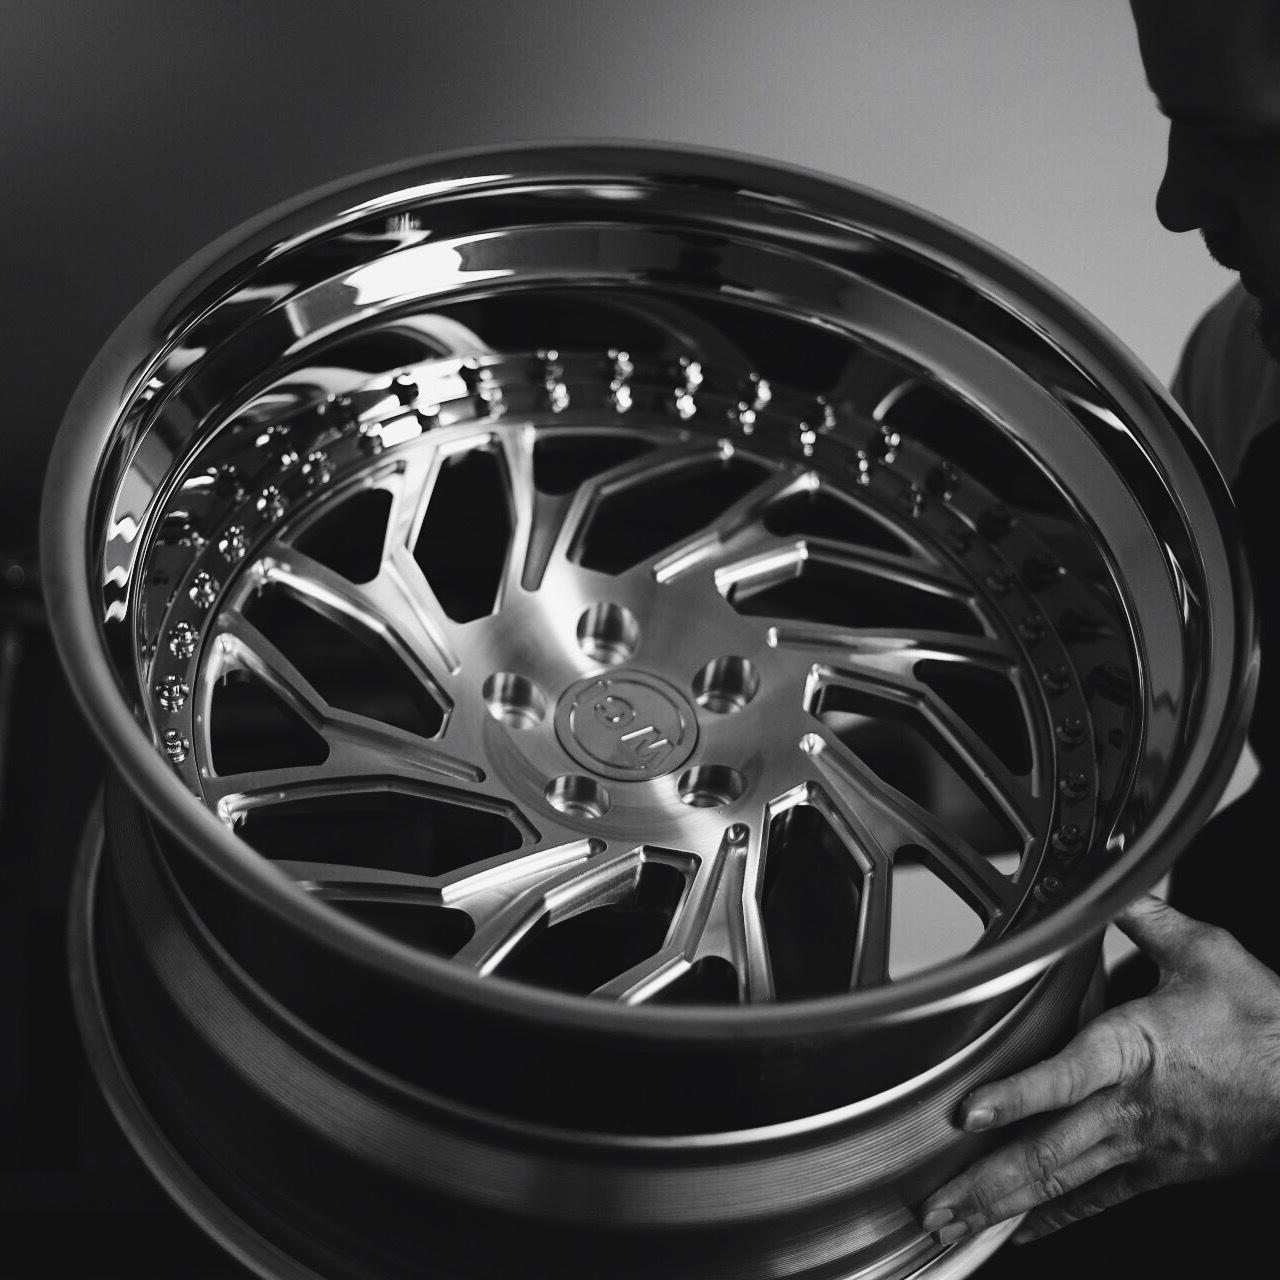 WATERCOOLED JB1 forged wheels